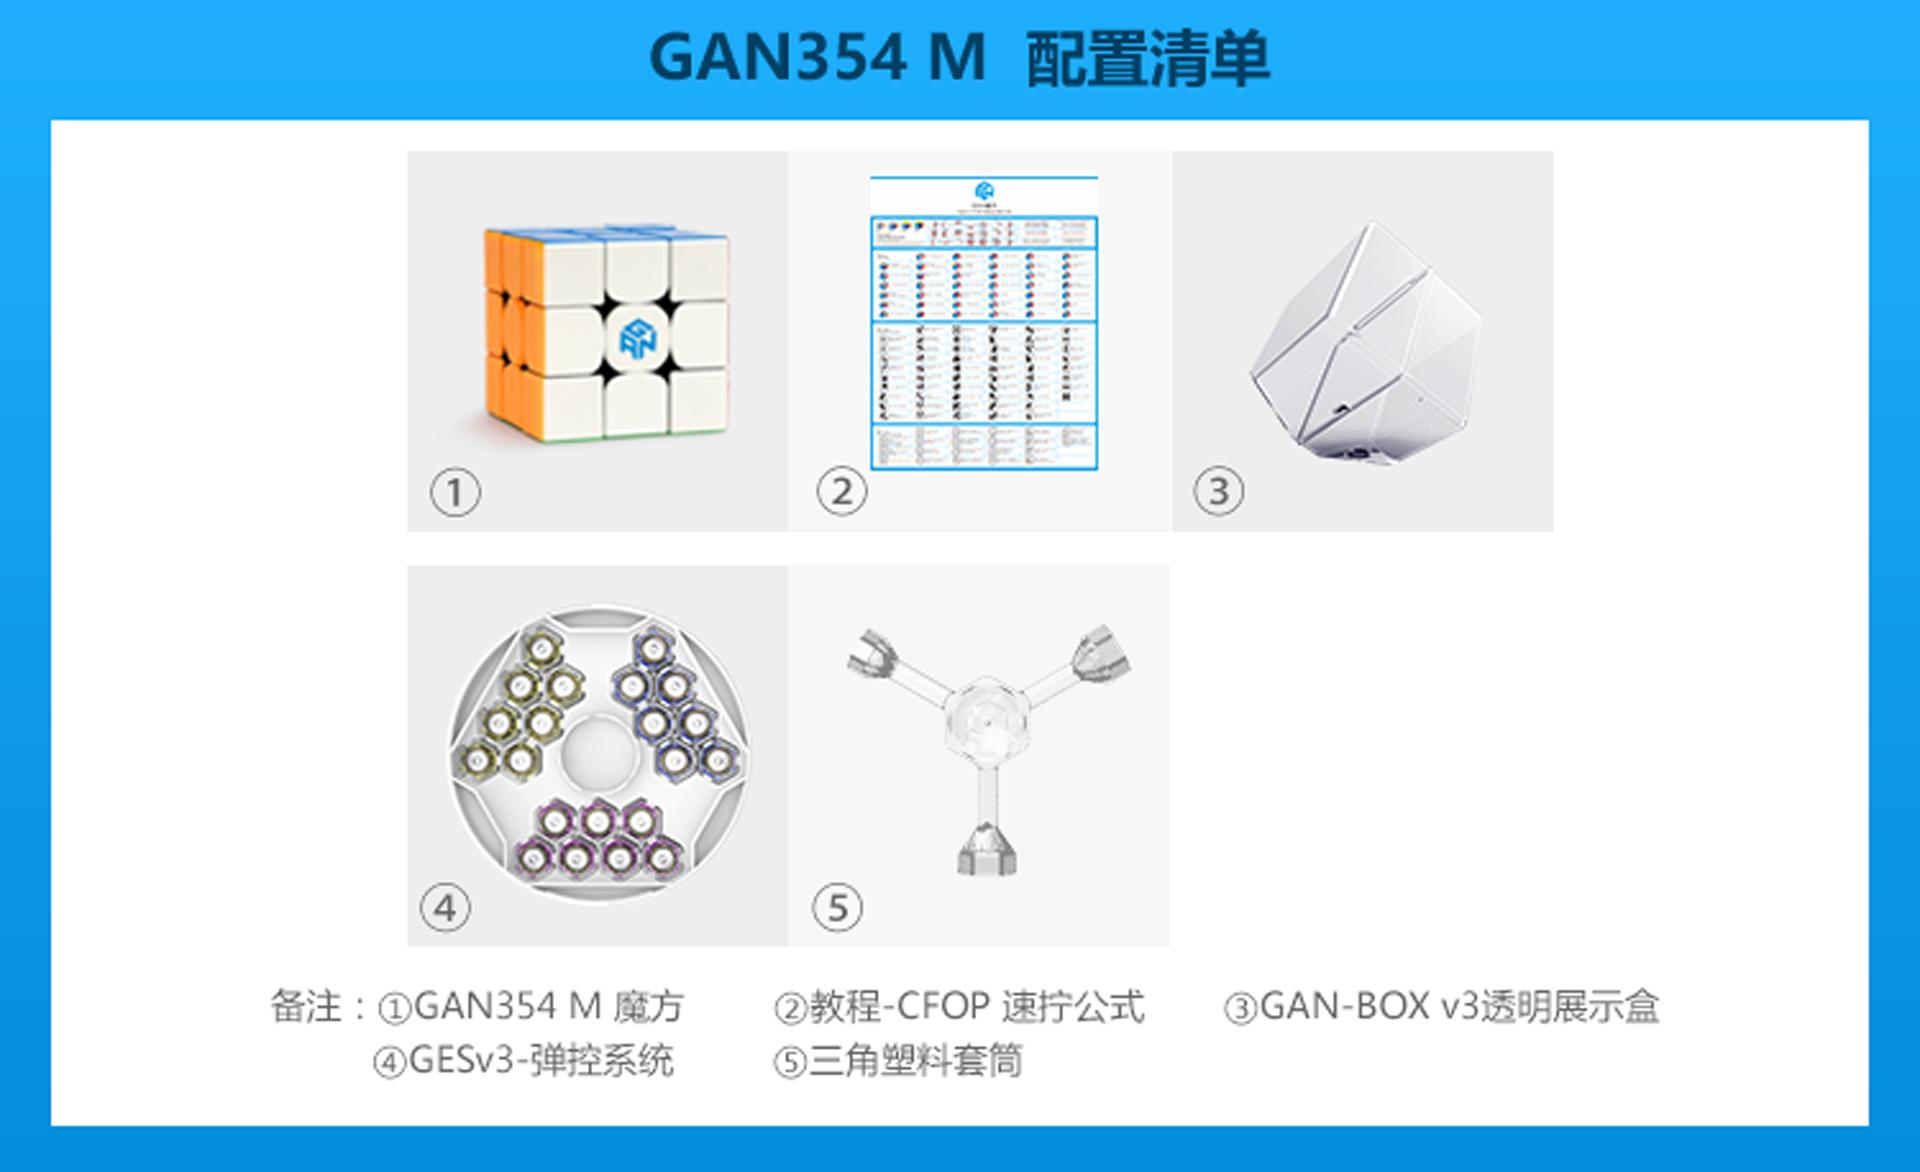 18-06-30-GAN354-M配置表2